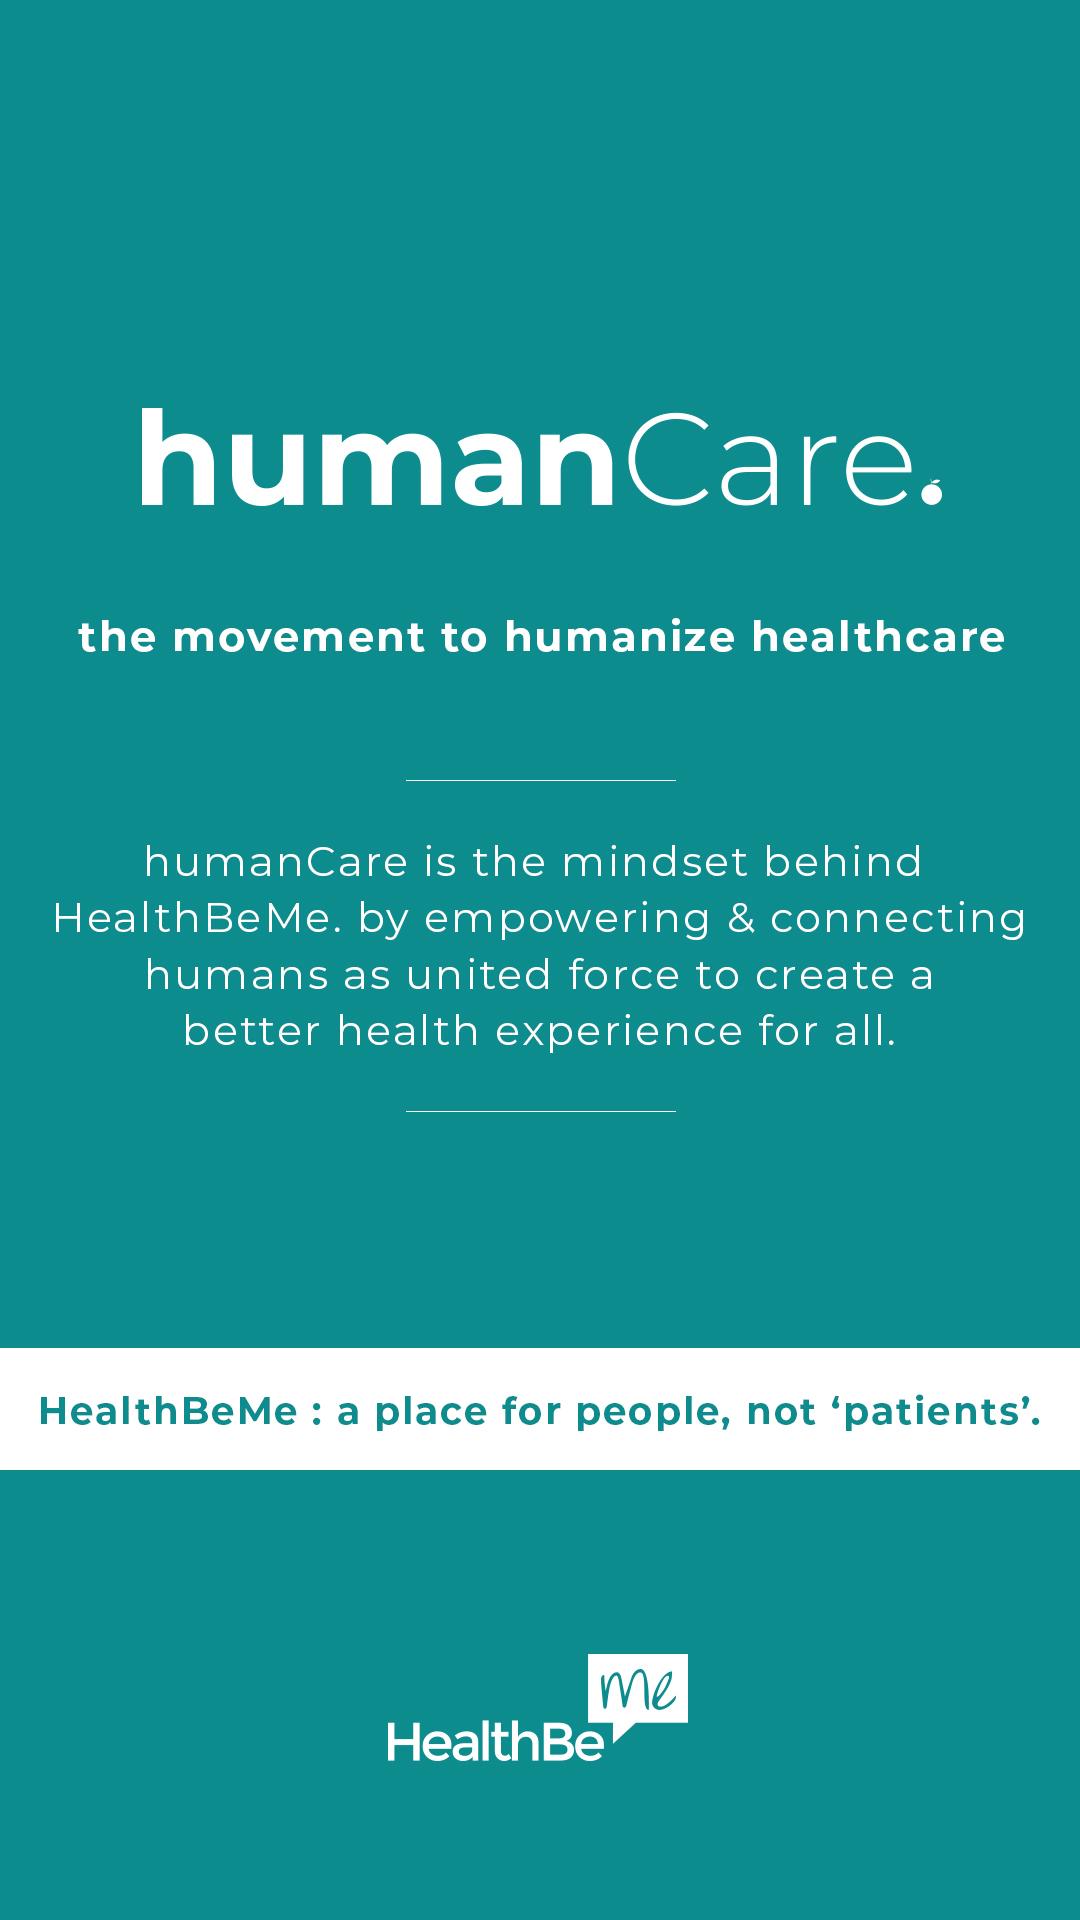 humancare_story_explained.jpg